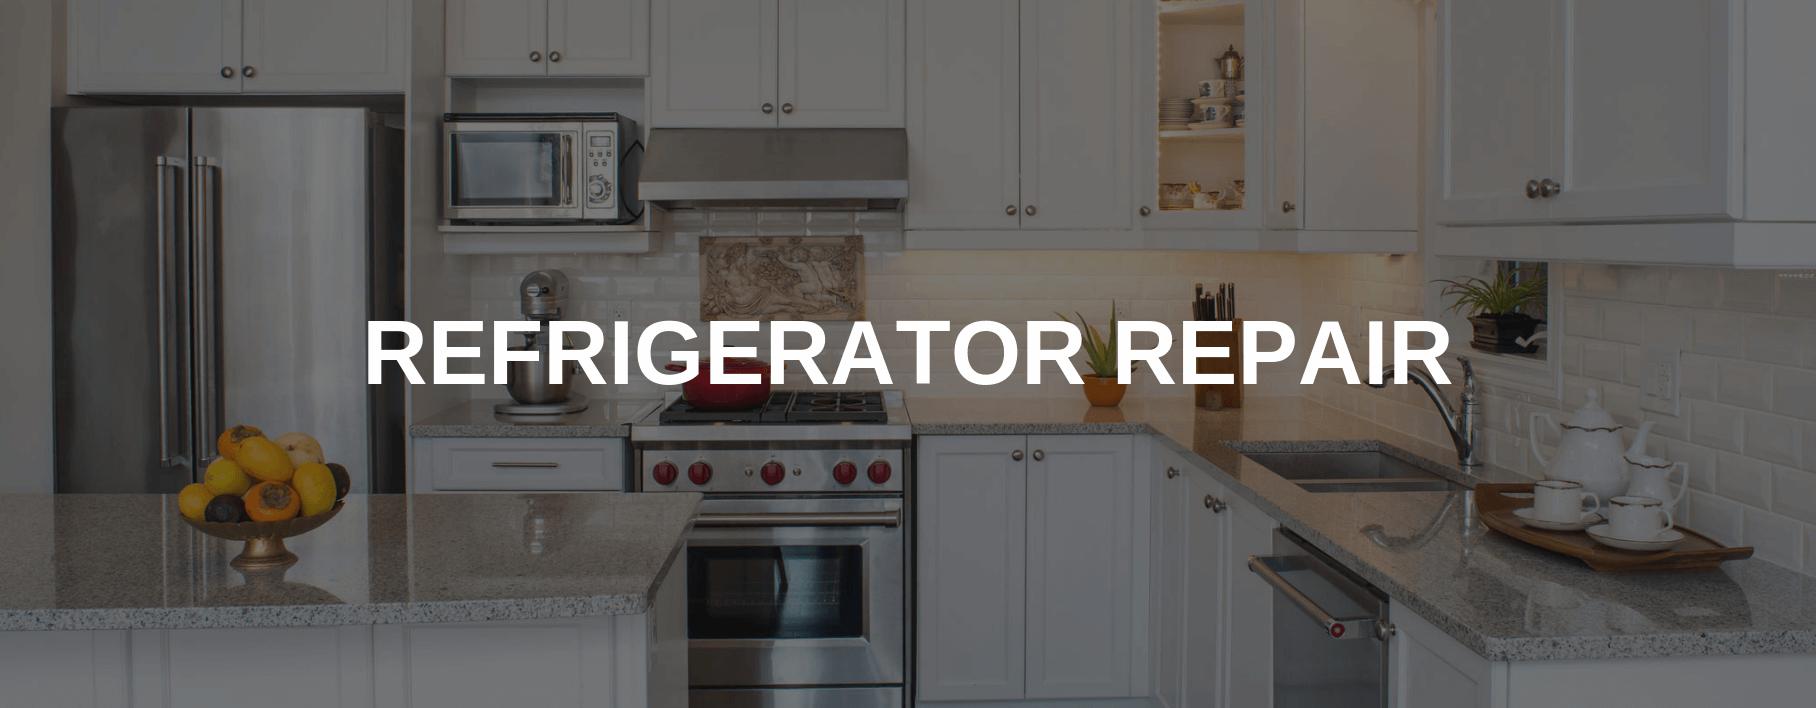 refrigerator repair colorado springs